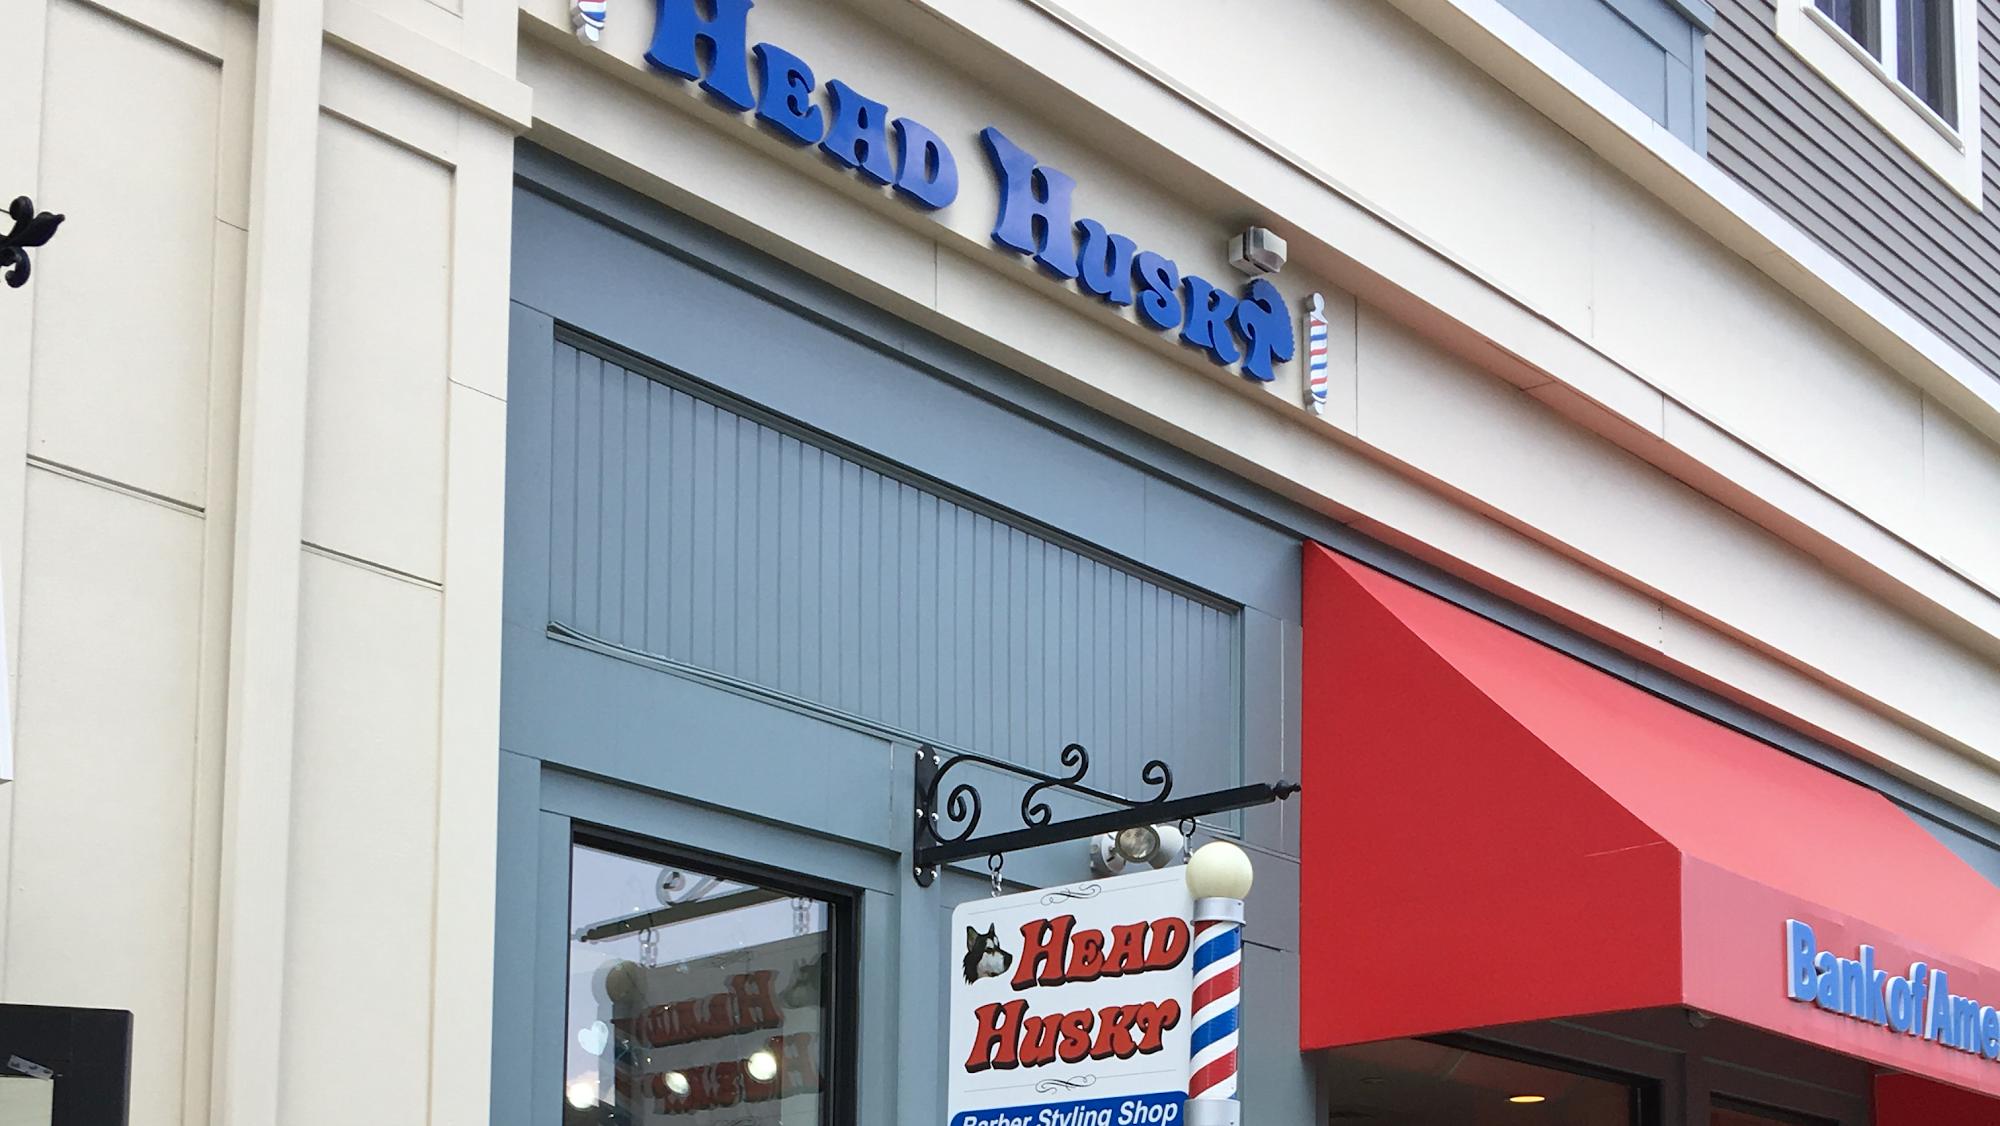 Head Husky Barber Styling Shop / Unique Art Gallery 9 Dog Ln suite b 104, Storrs